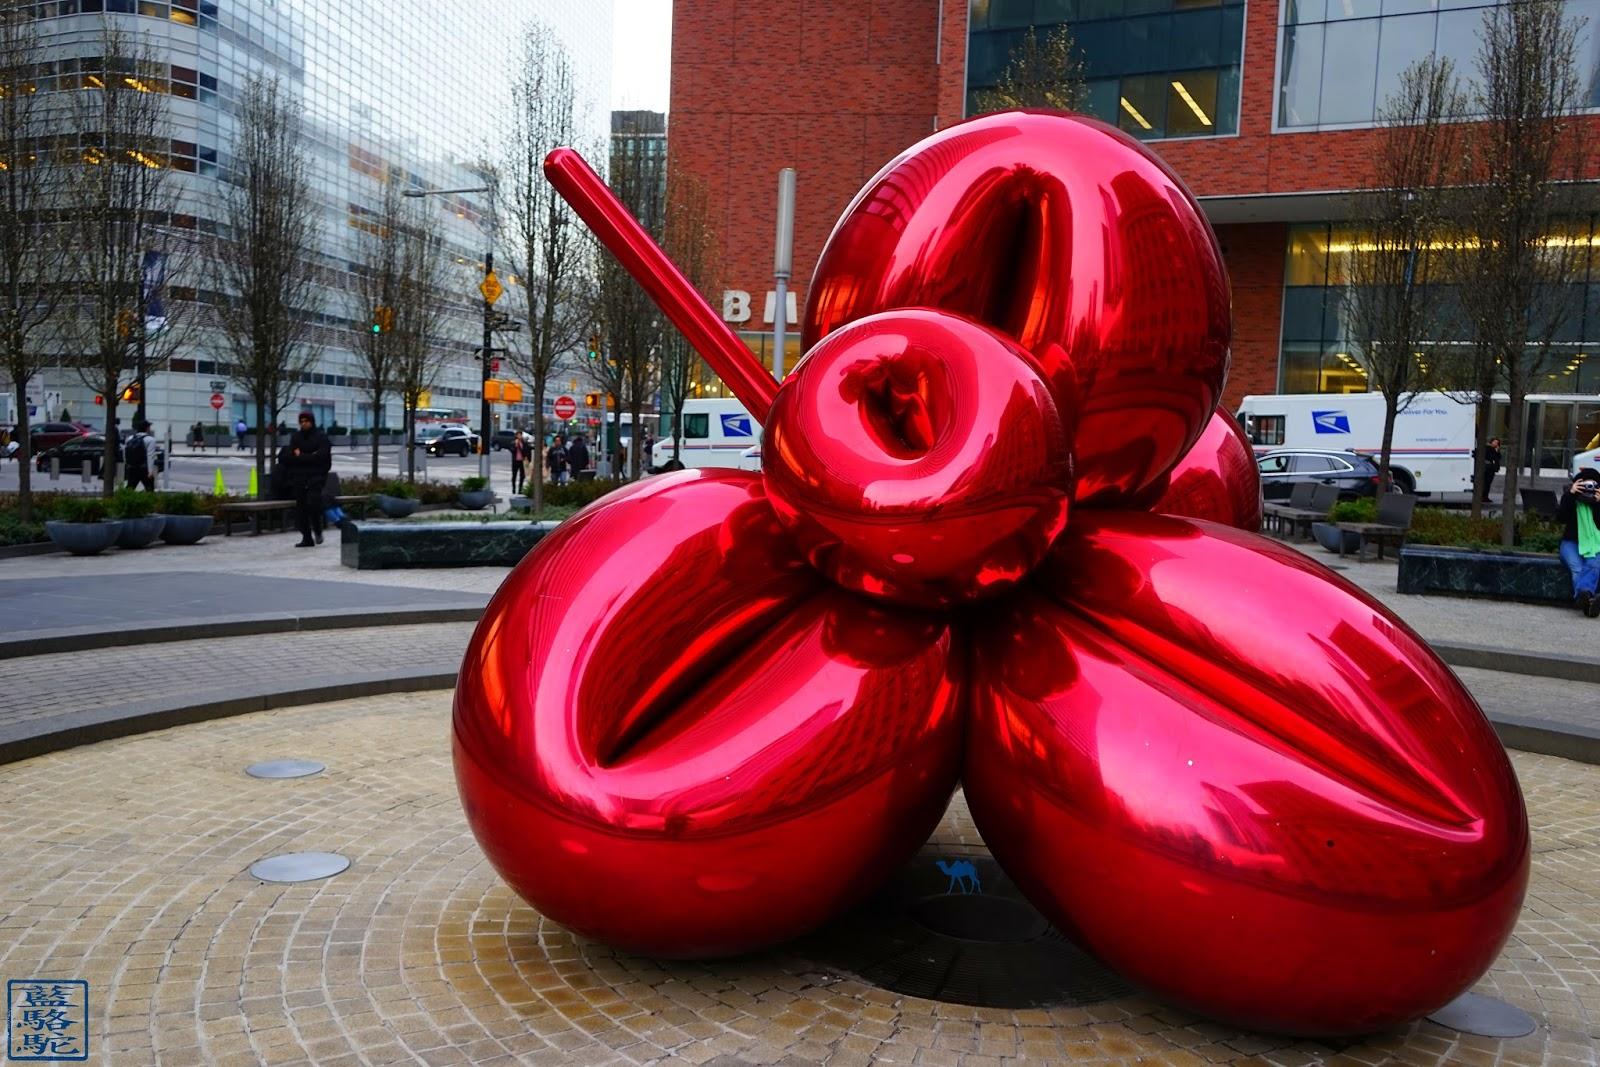 Le Chameau Bleu - Balloon Flower de Jeff KOONS